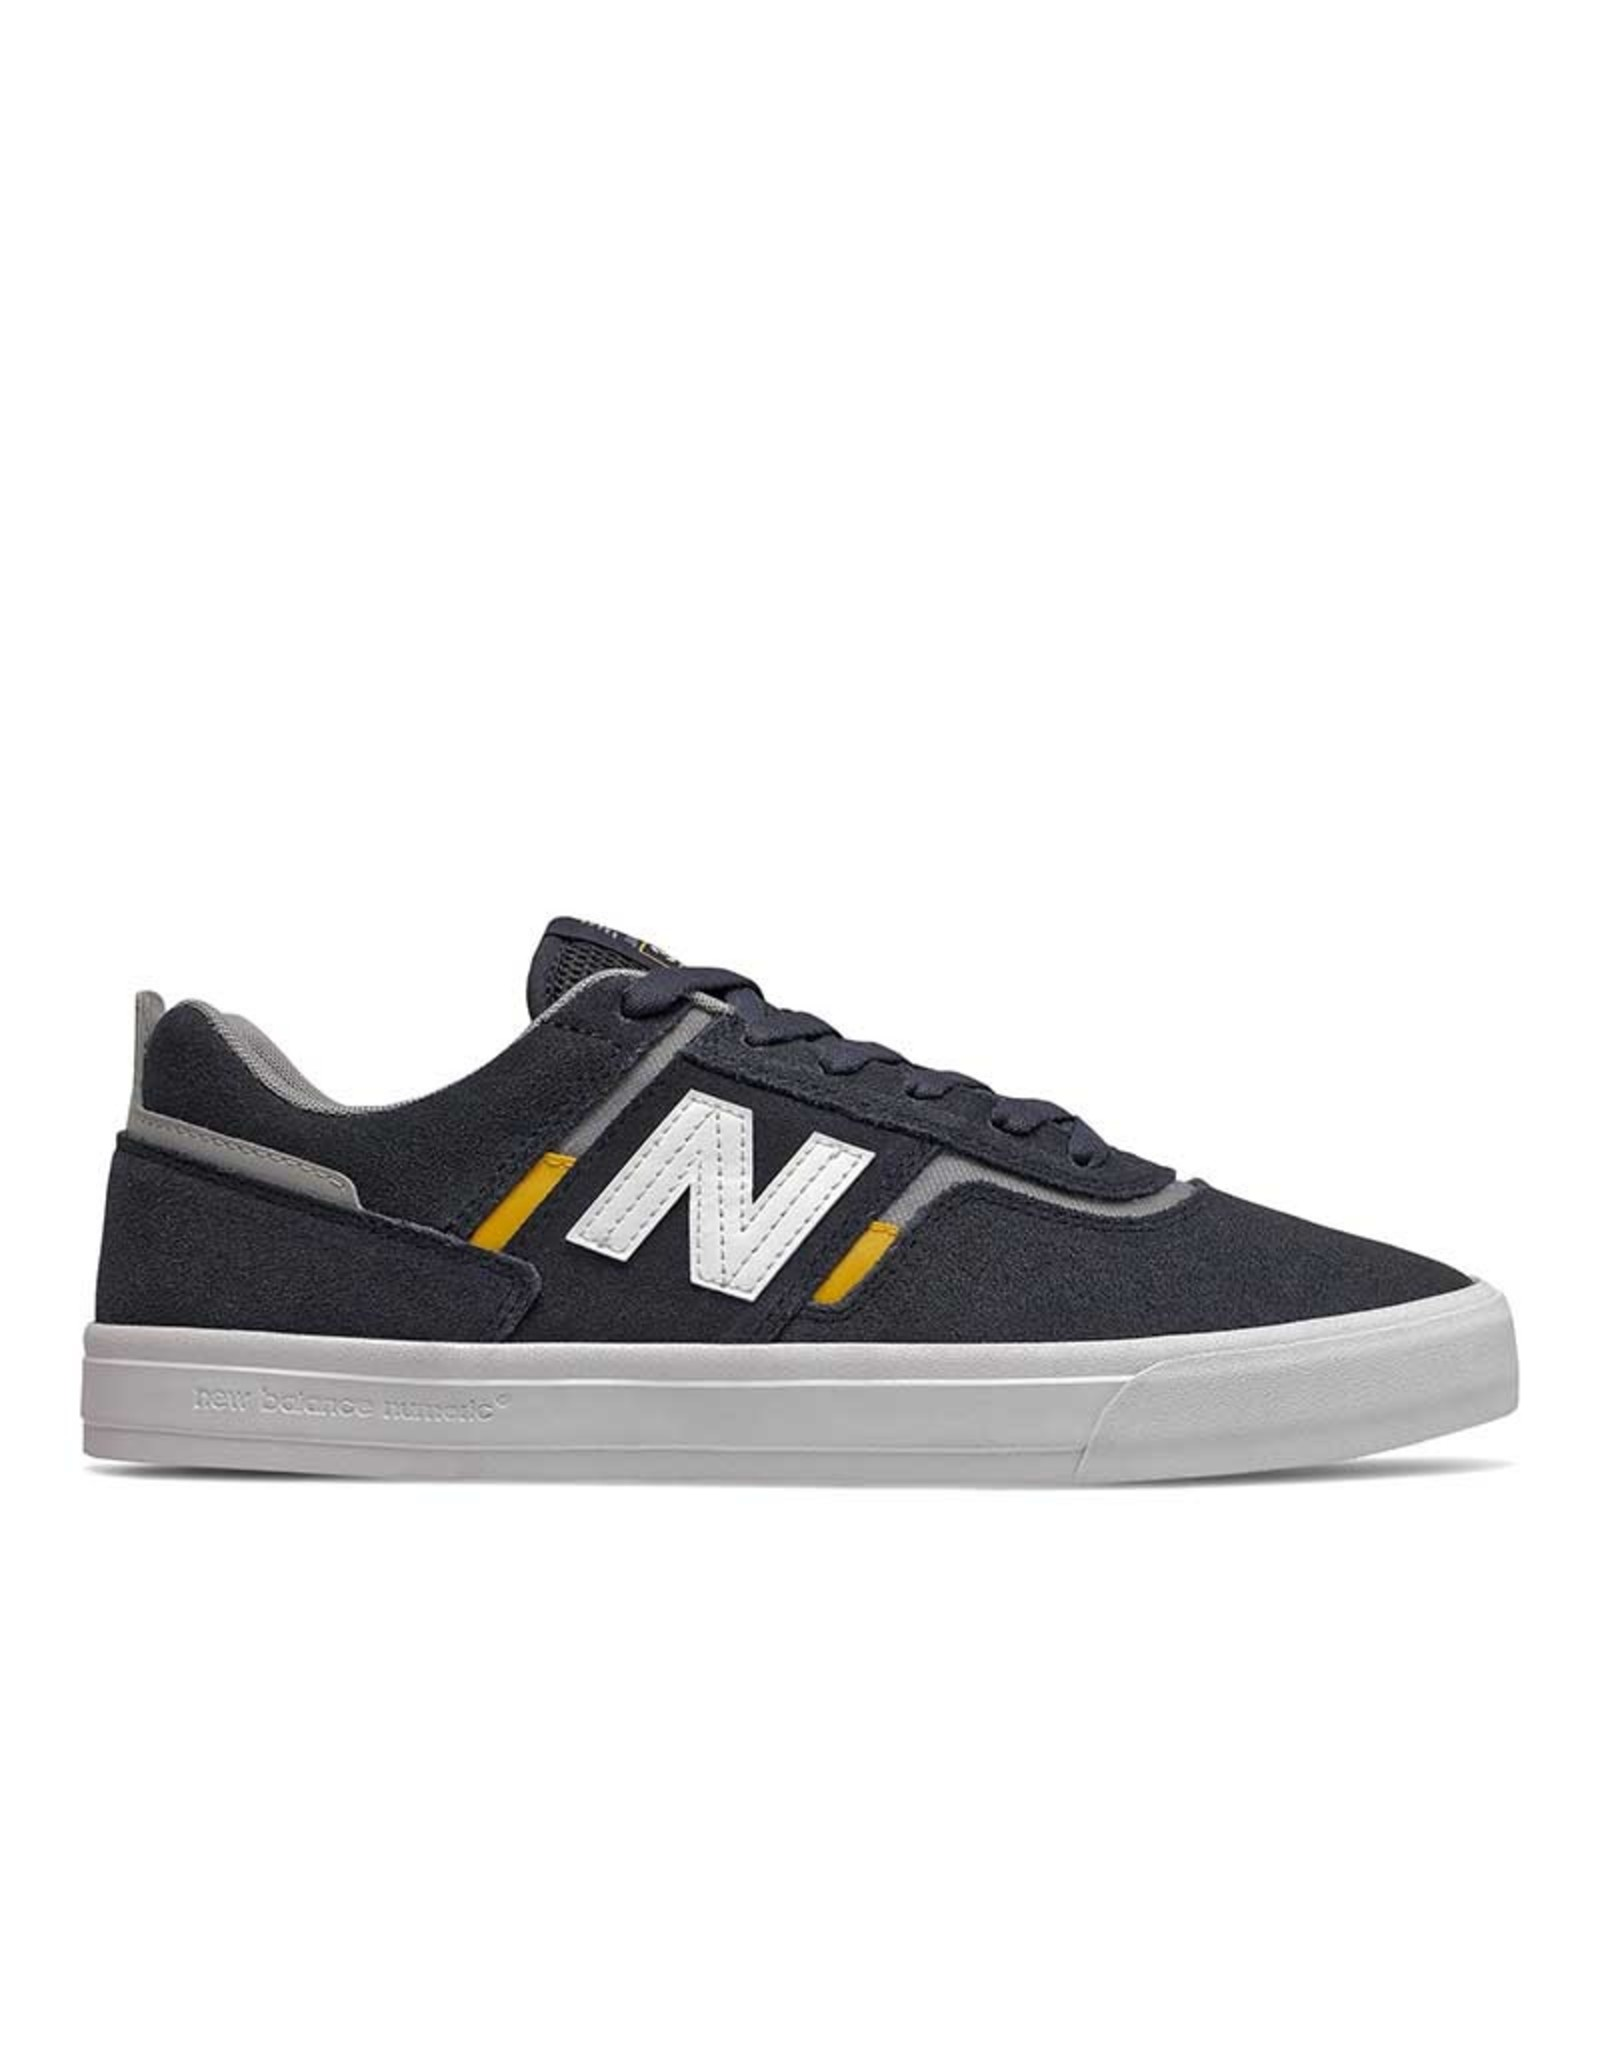 NEW BALANCE NEW BALANCE - 306 - NAVY/YELLOW